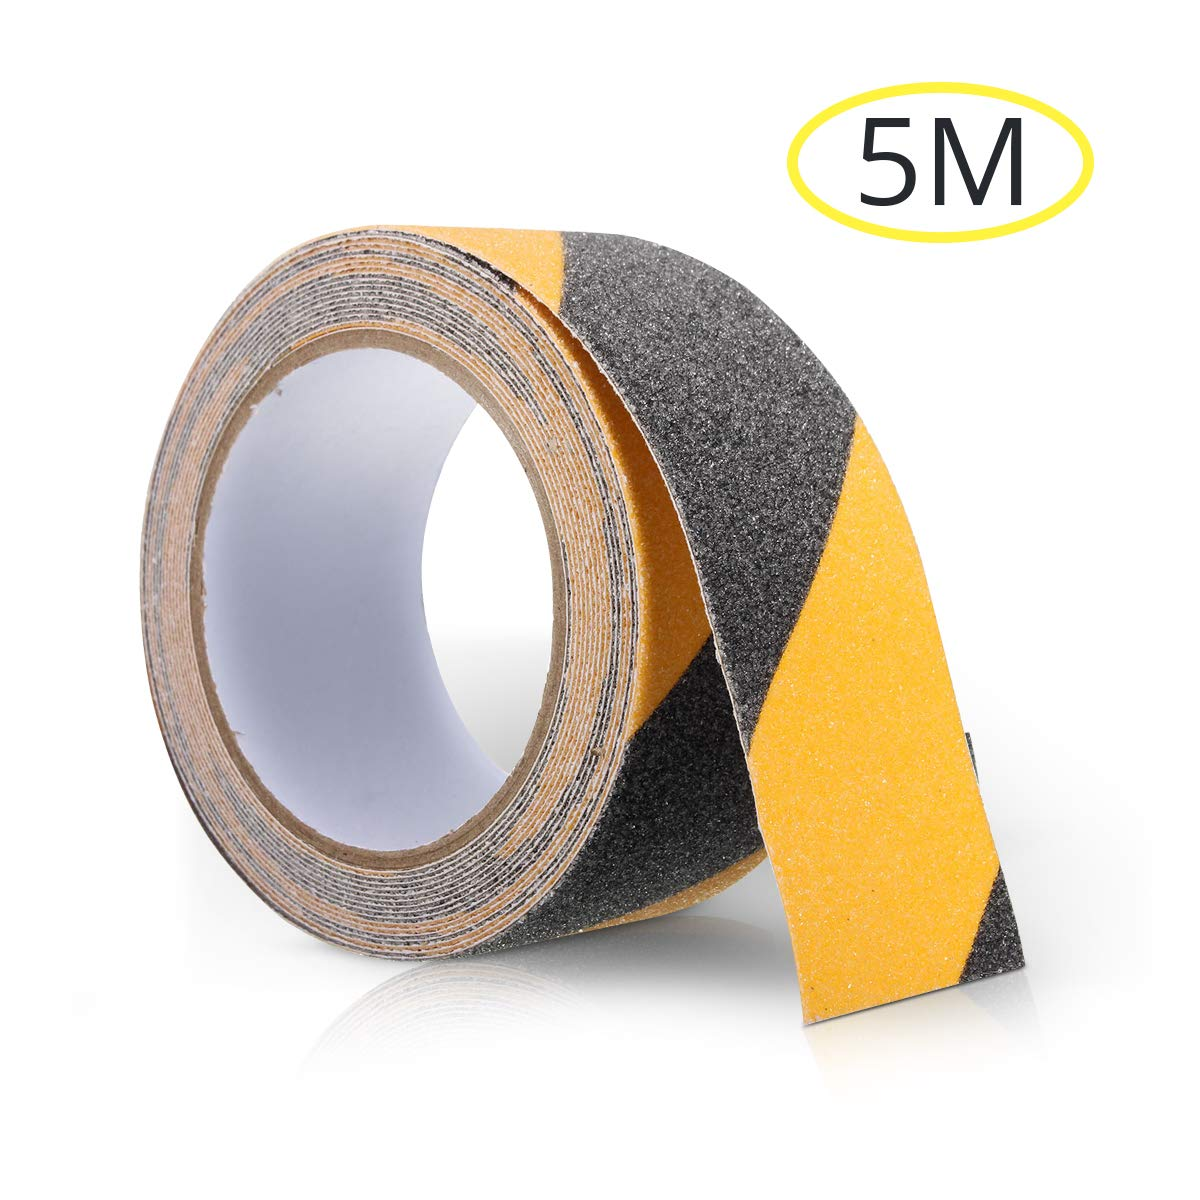 SAFETYON Cinta de Antideslizante 50MM x 5M PVC para Escaleras Piscina Negro+Amarillo: Amazon.es: Hogar